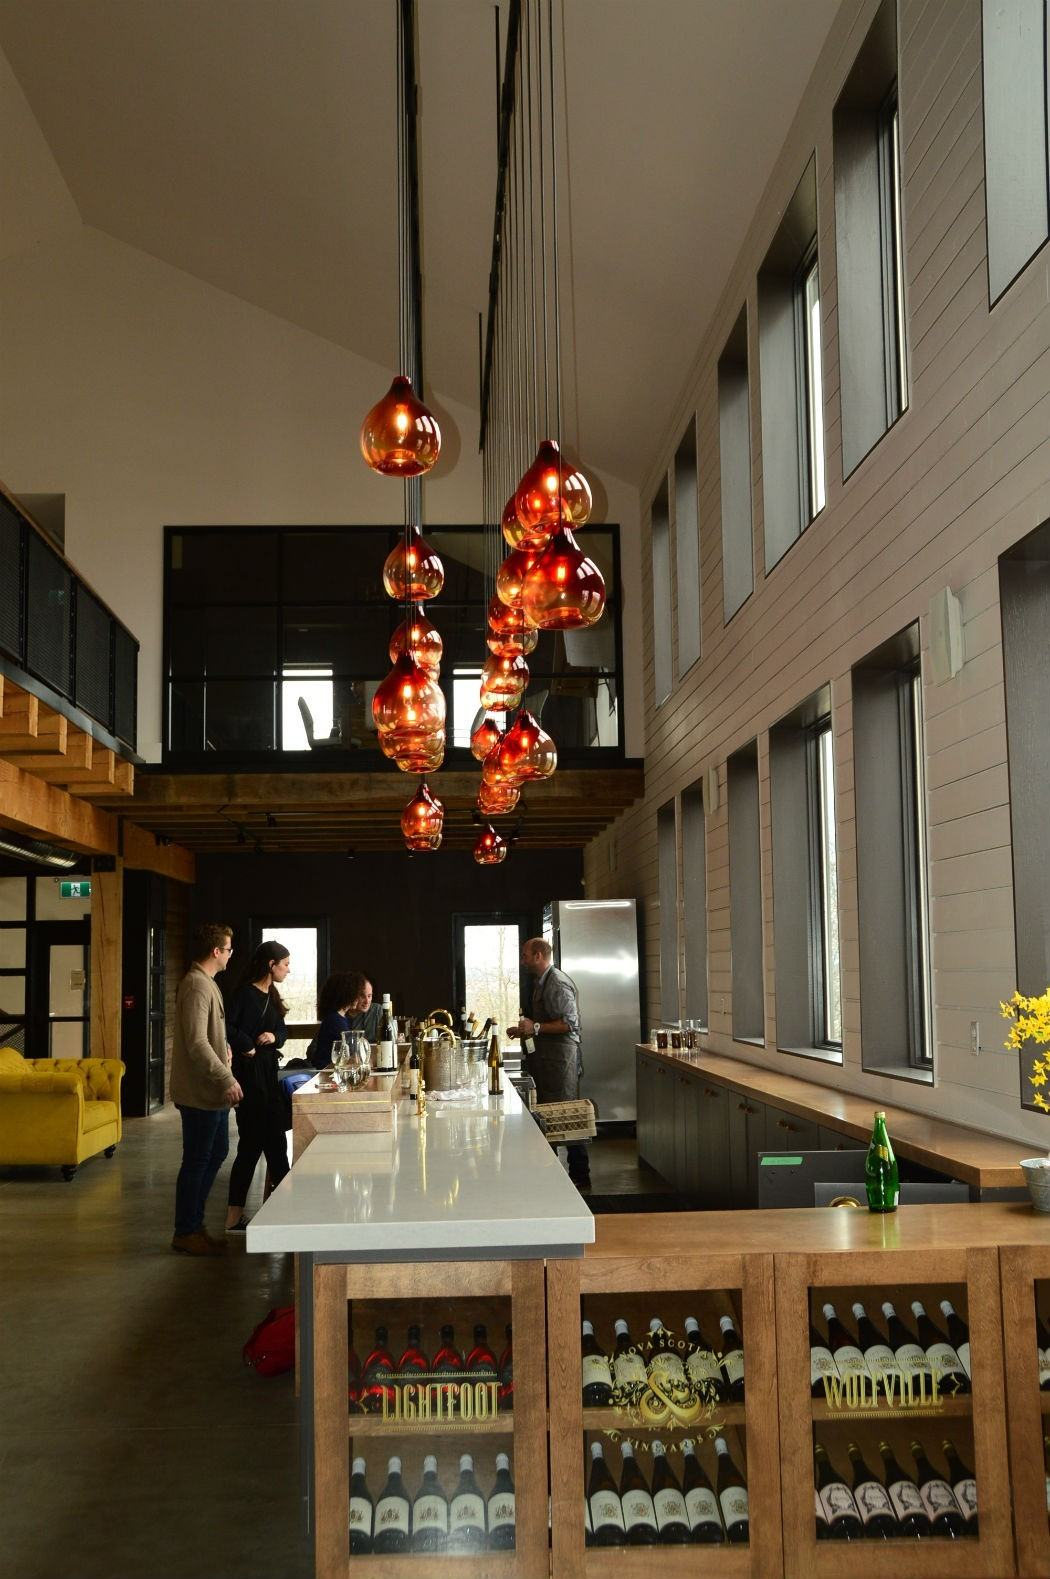 tasting room at Lightfoot & Wolfville